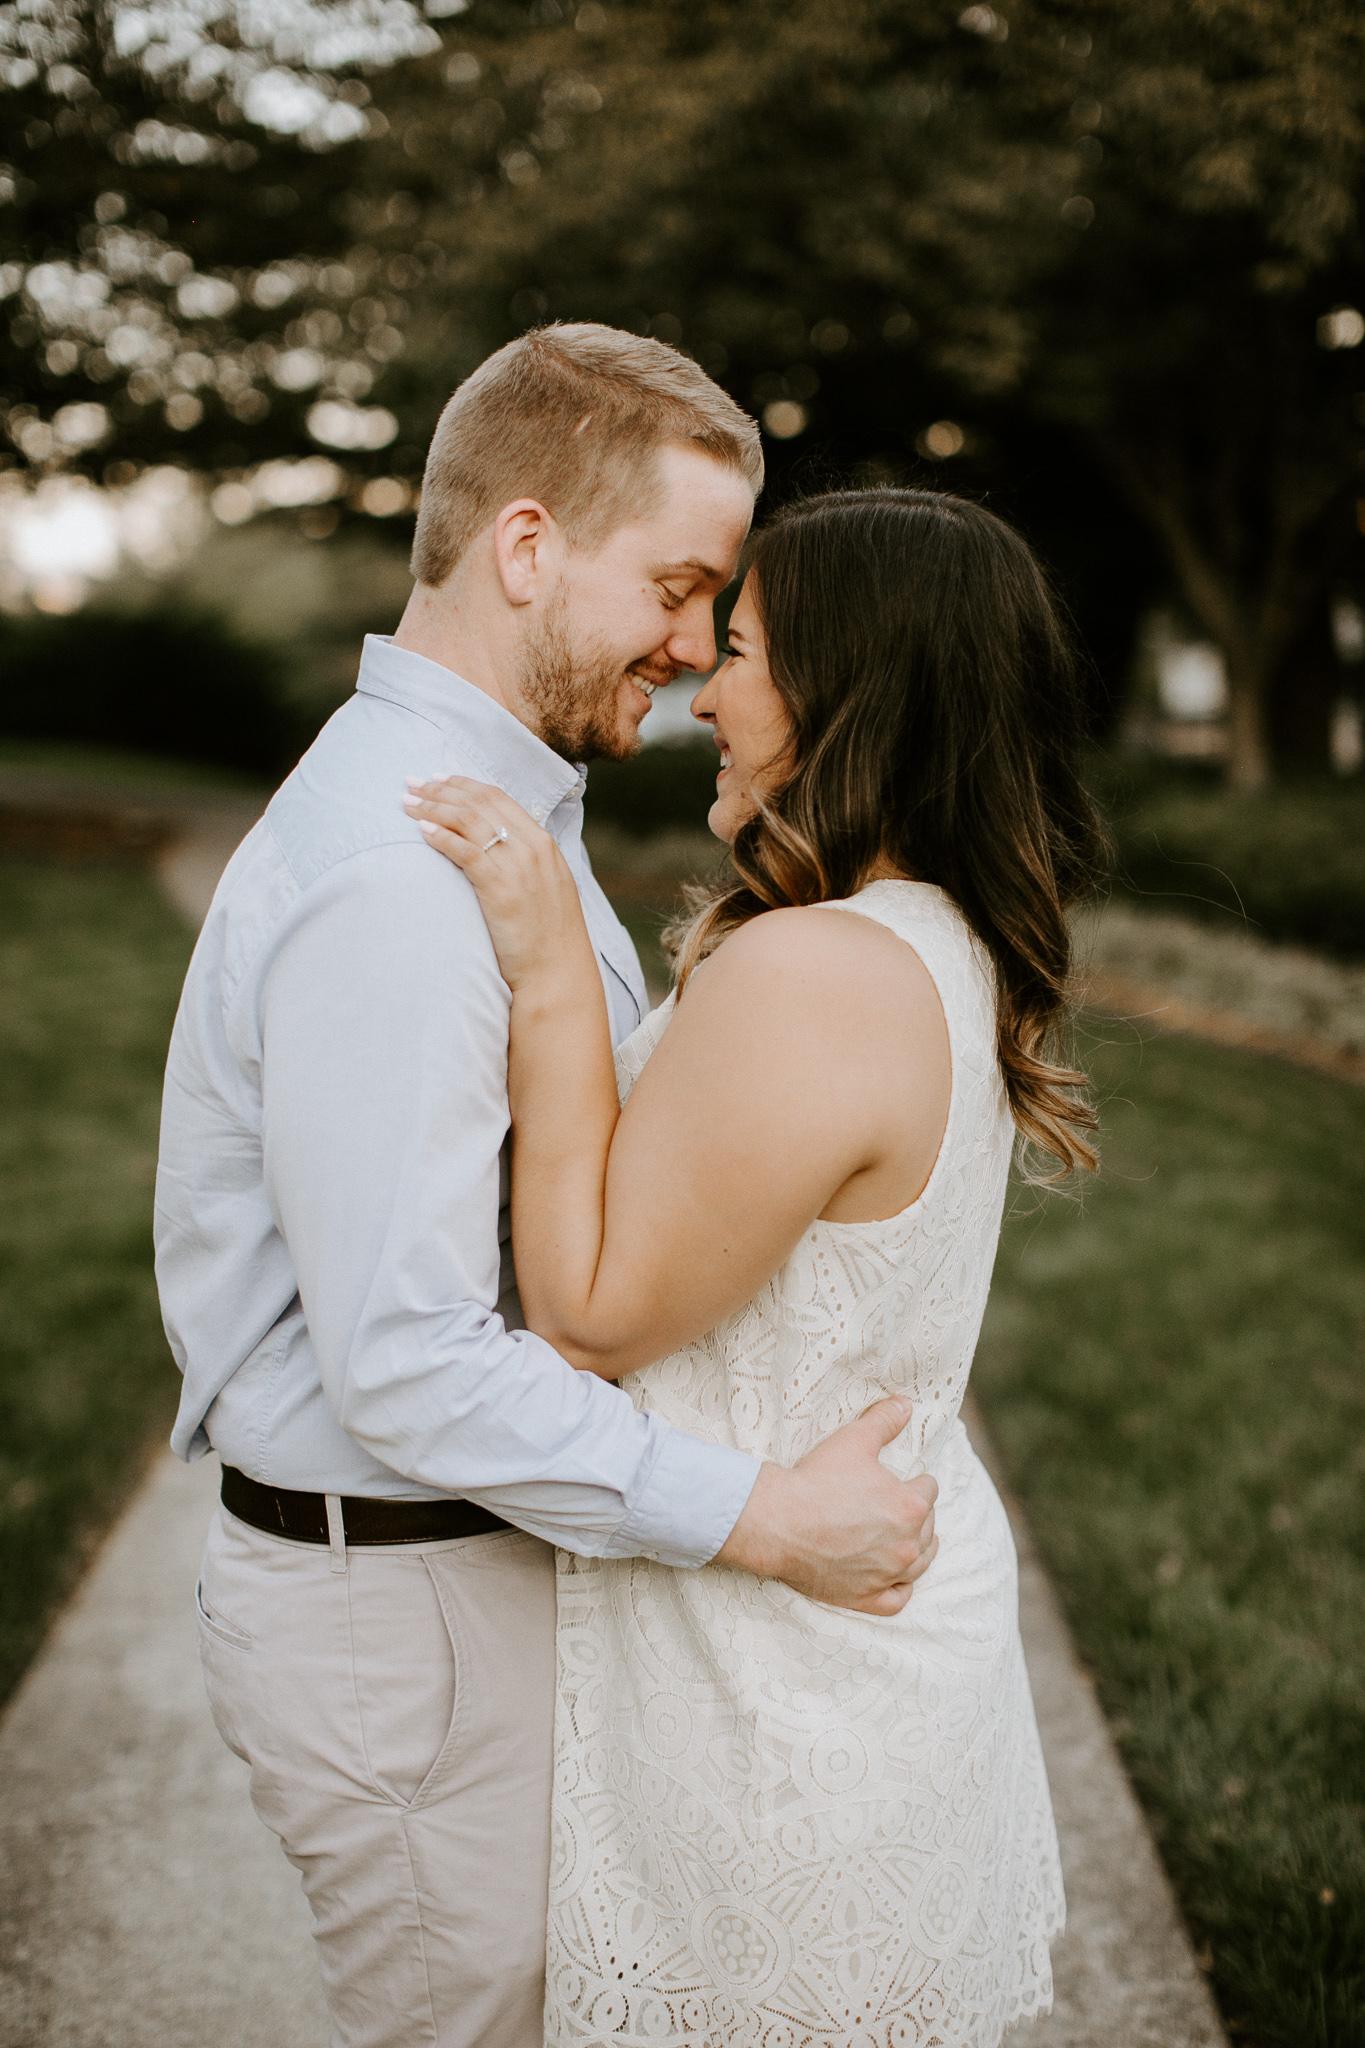 Engagement - Downtown Roanoke -  Wedding Photographer - Virginia - Best - Pat Cori Photography-29.jpg